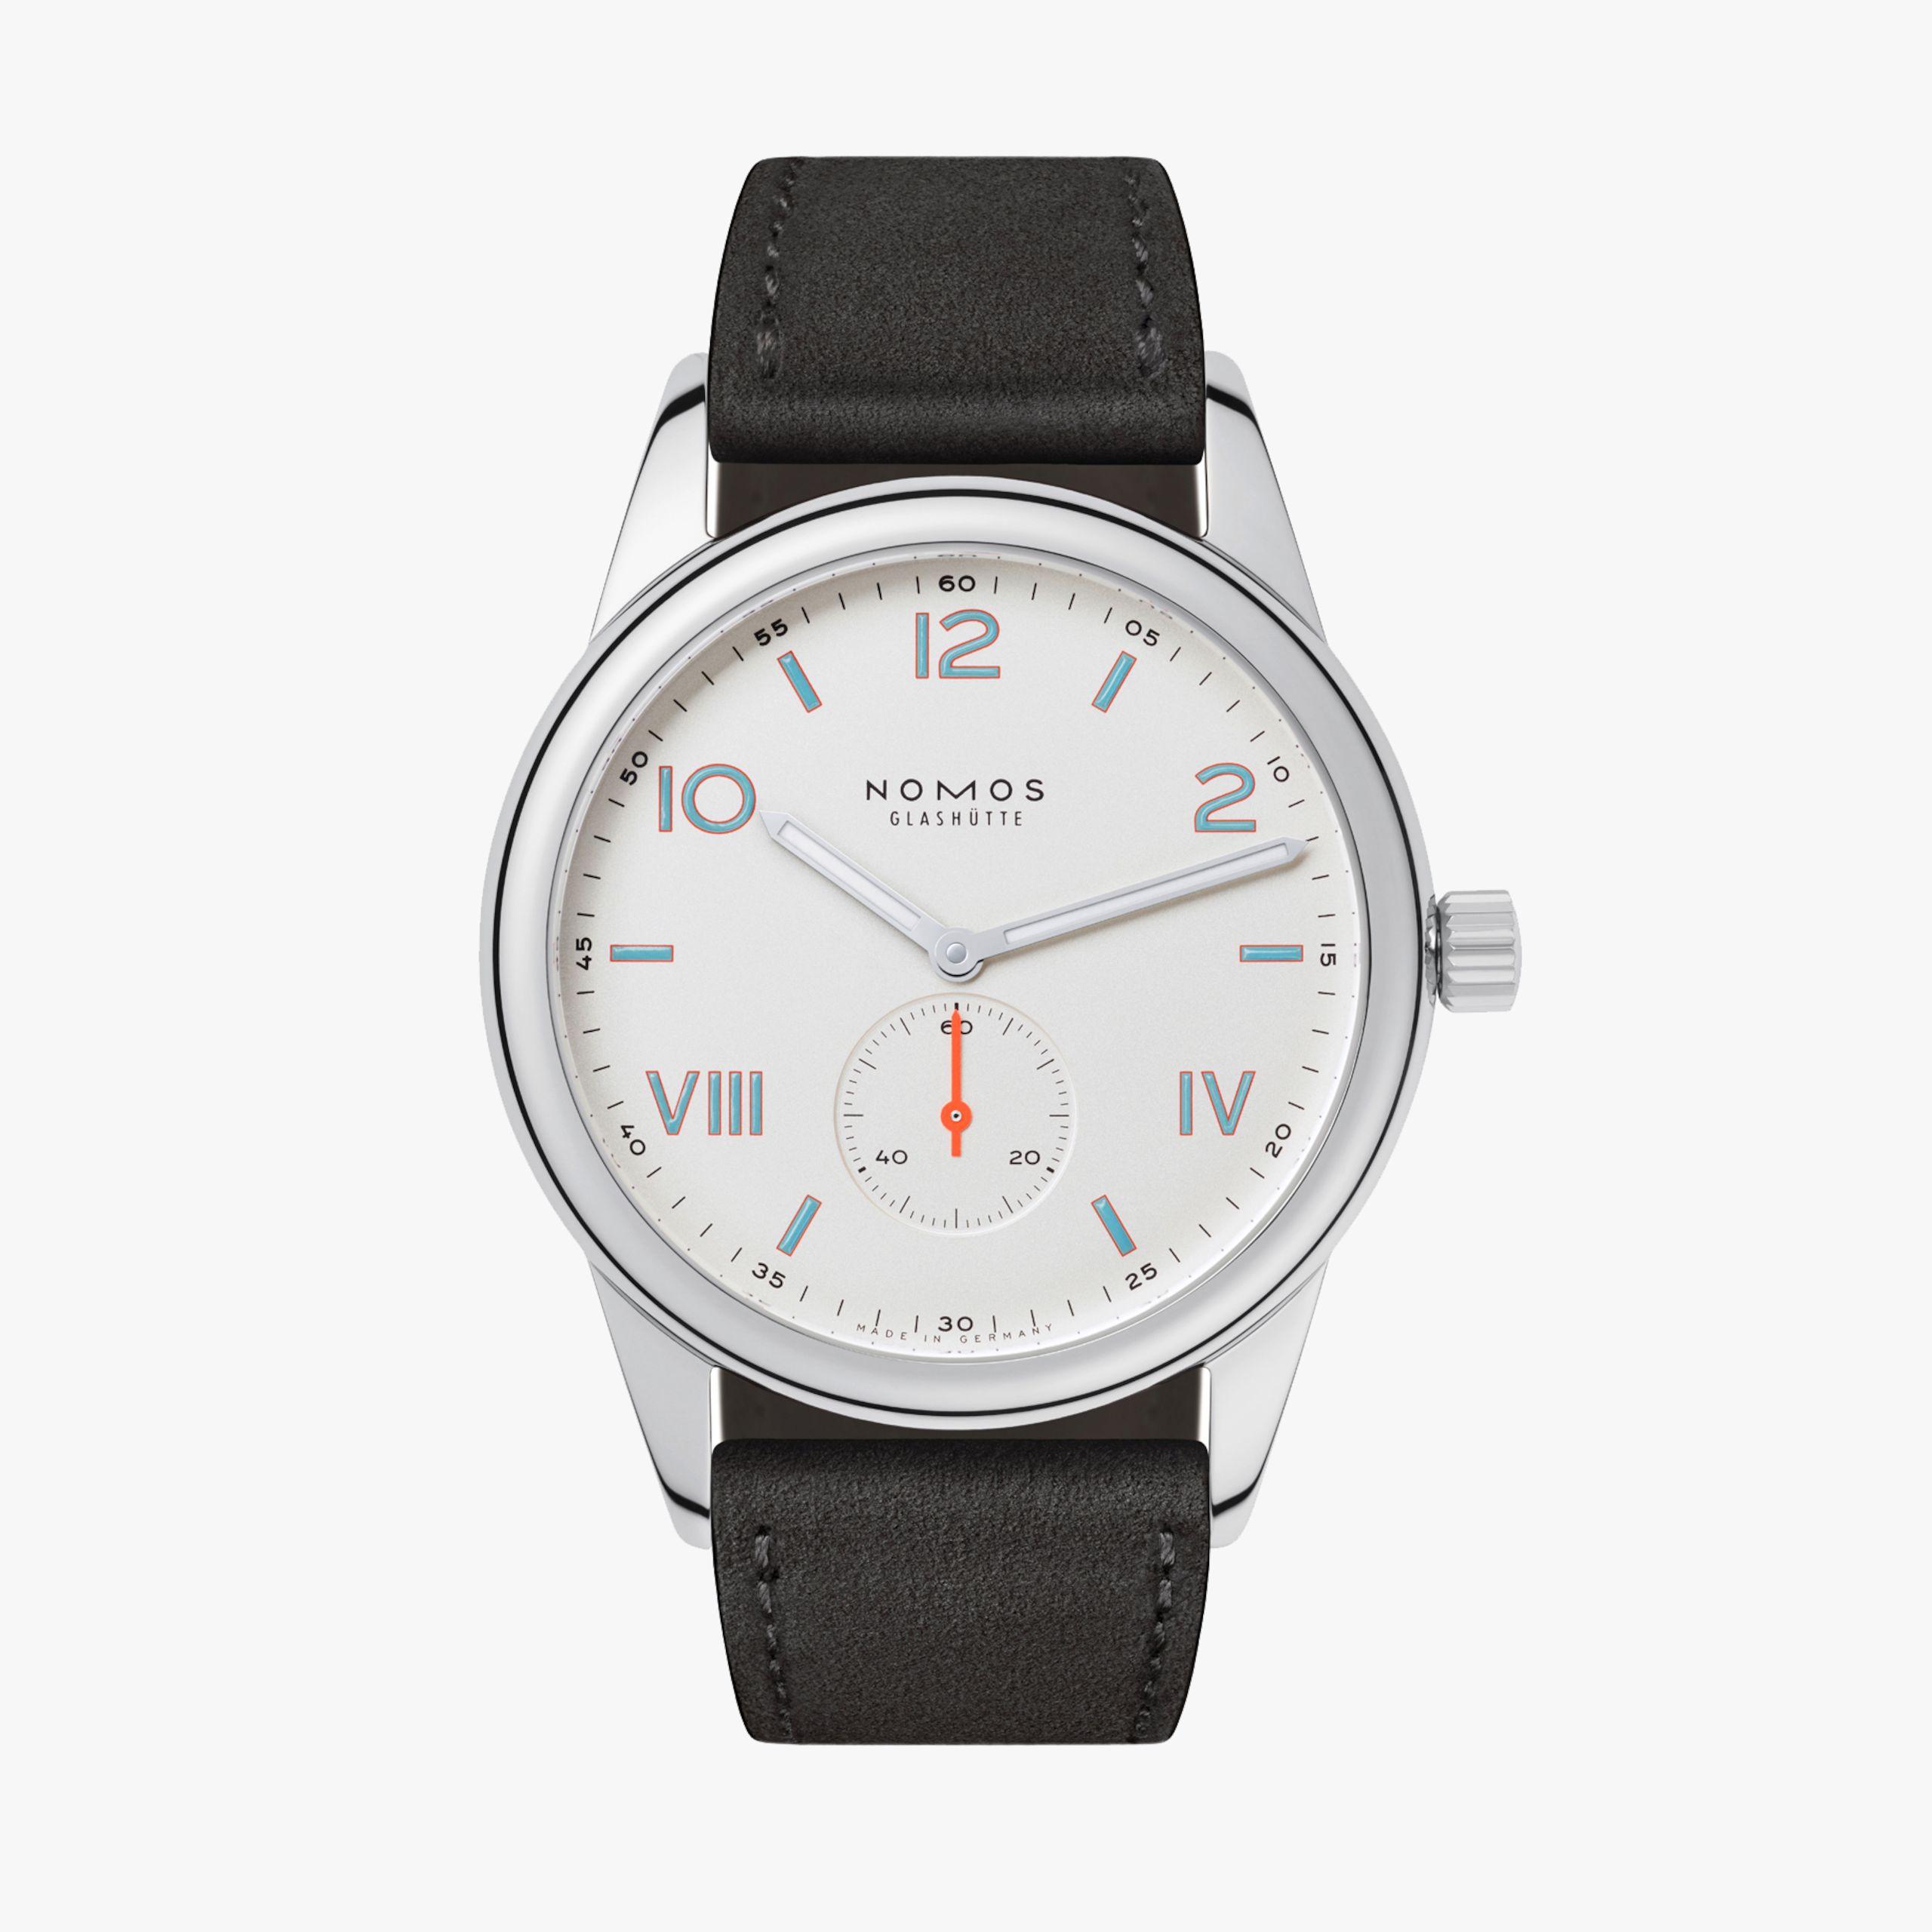 Best mid-size watches rolex tudor seiko grand seiko